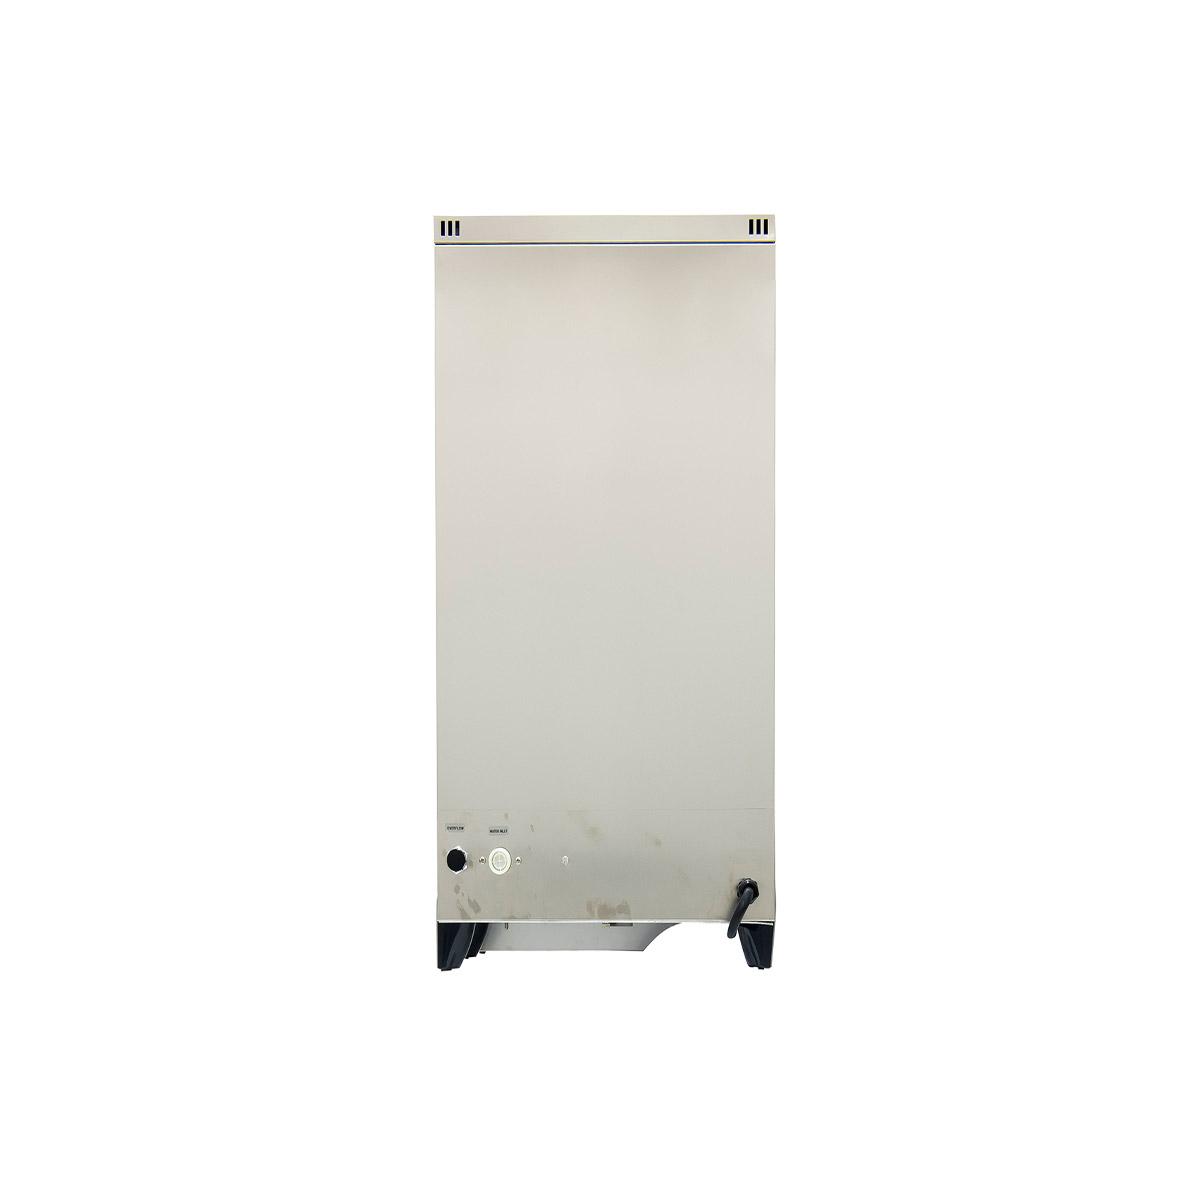 Instanta Sureflow High Volume Counter Top Water Boiler CTSV50T/9 Twin Taps 50Ltr